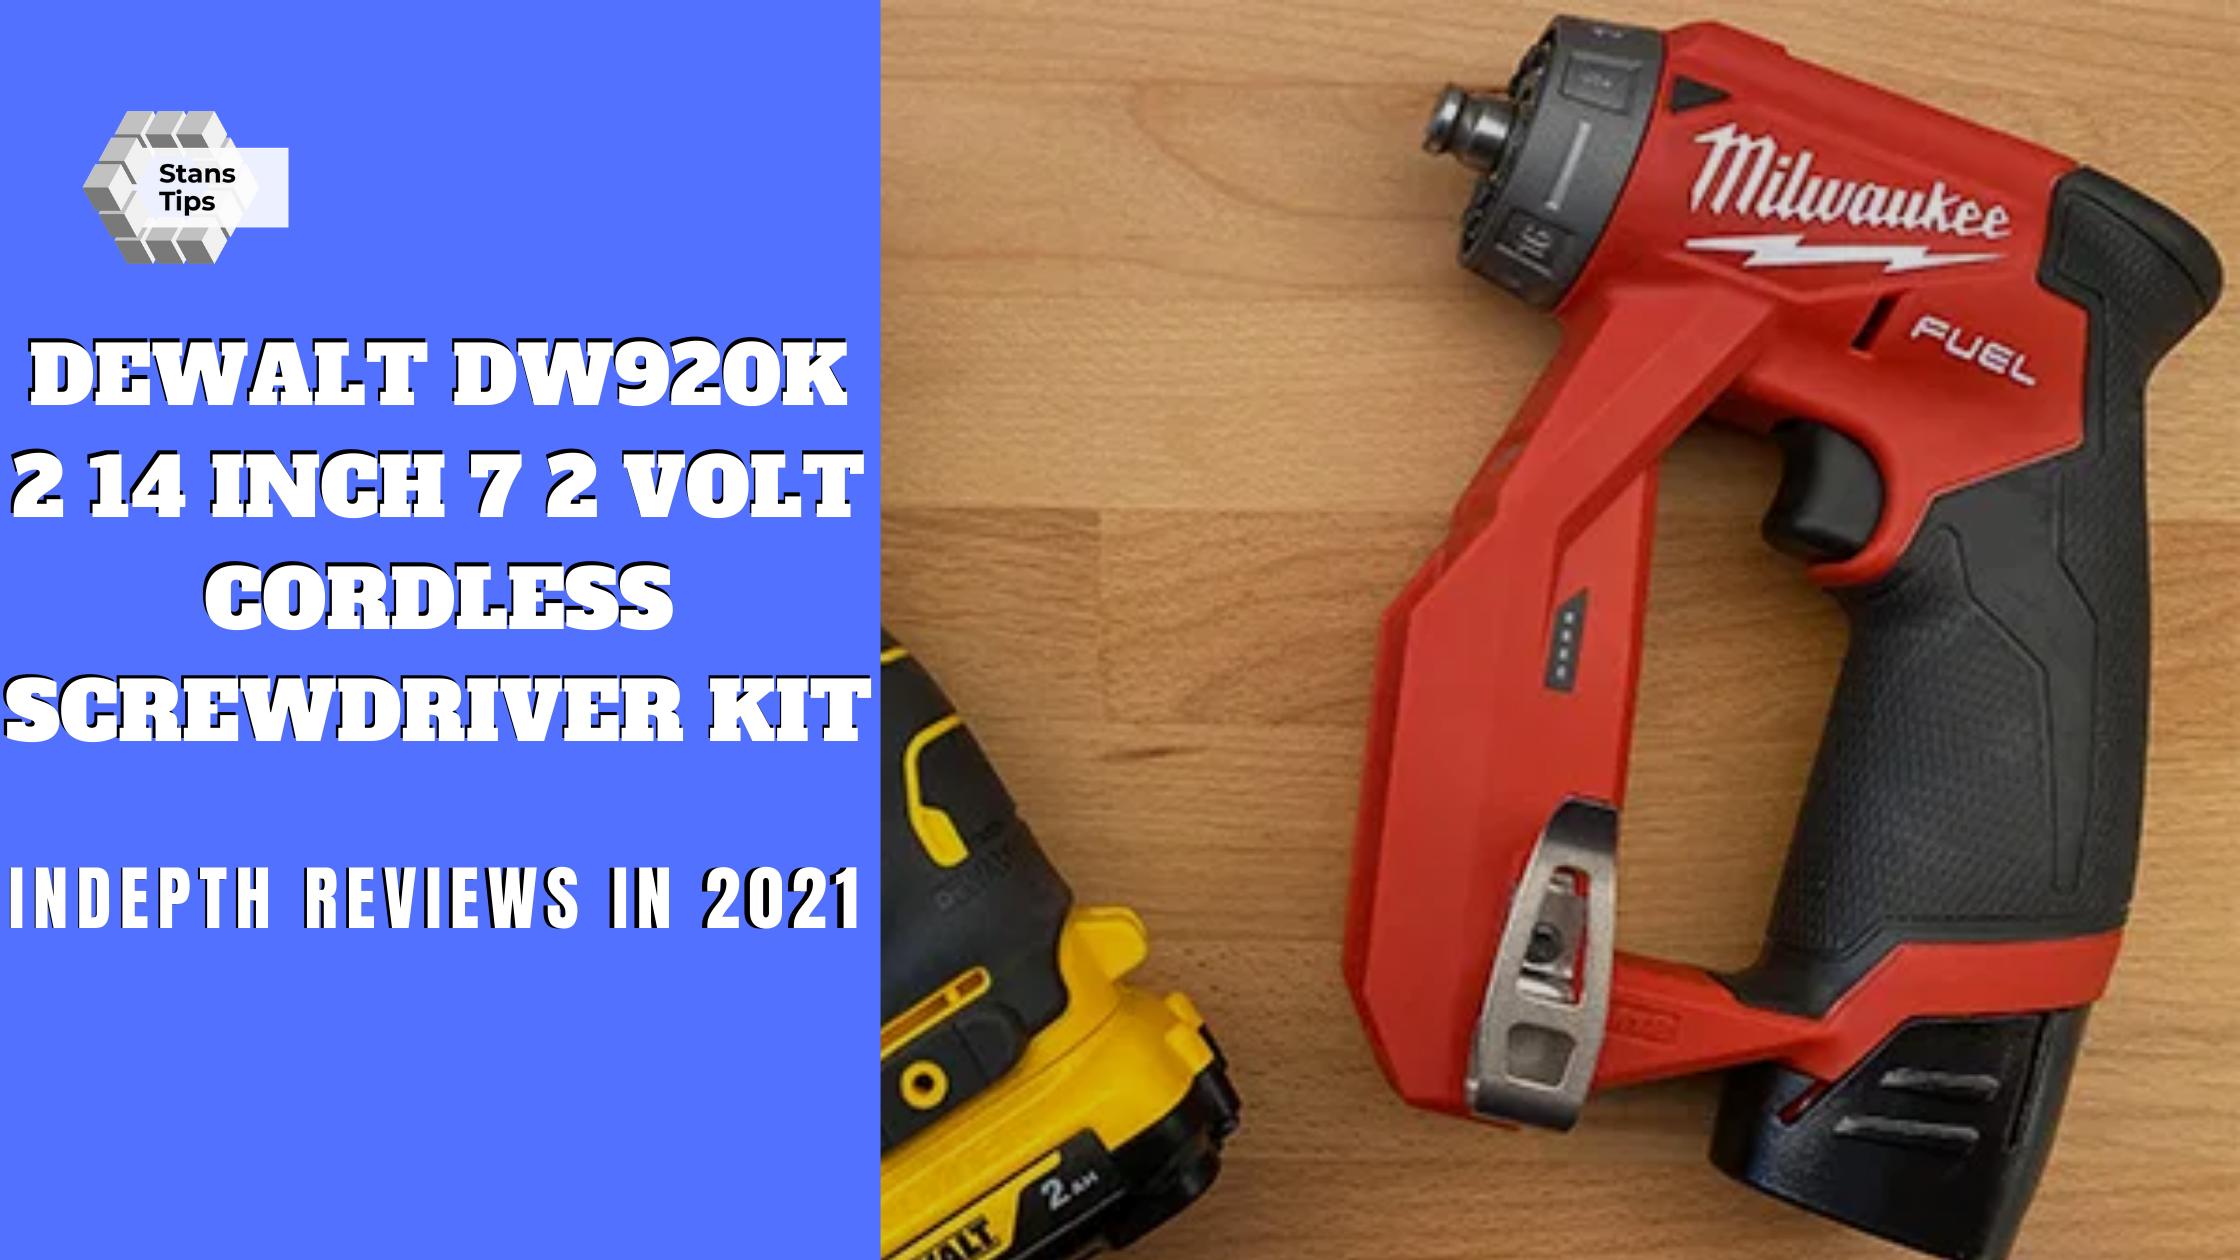 Dewalt dw920k 2 14 inch 7 2 volt cordless two position screwdriver kit